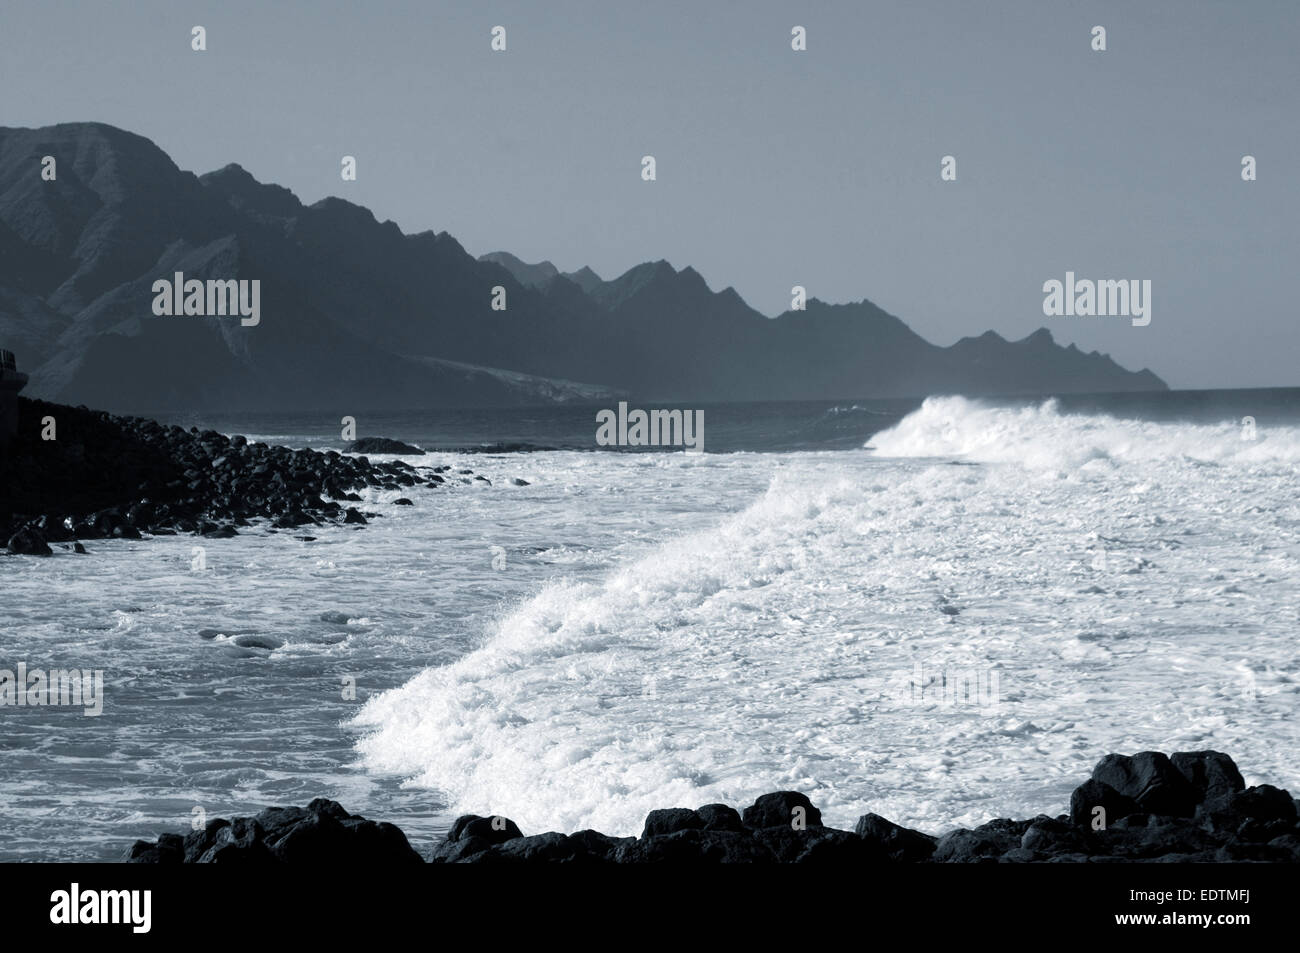 rocky craggy coastline of gran canaria canary islands canaries isles rough sea seas white foam foaming wave waves - Stock Image